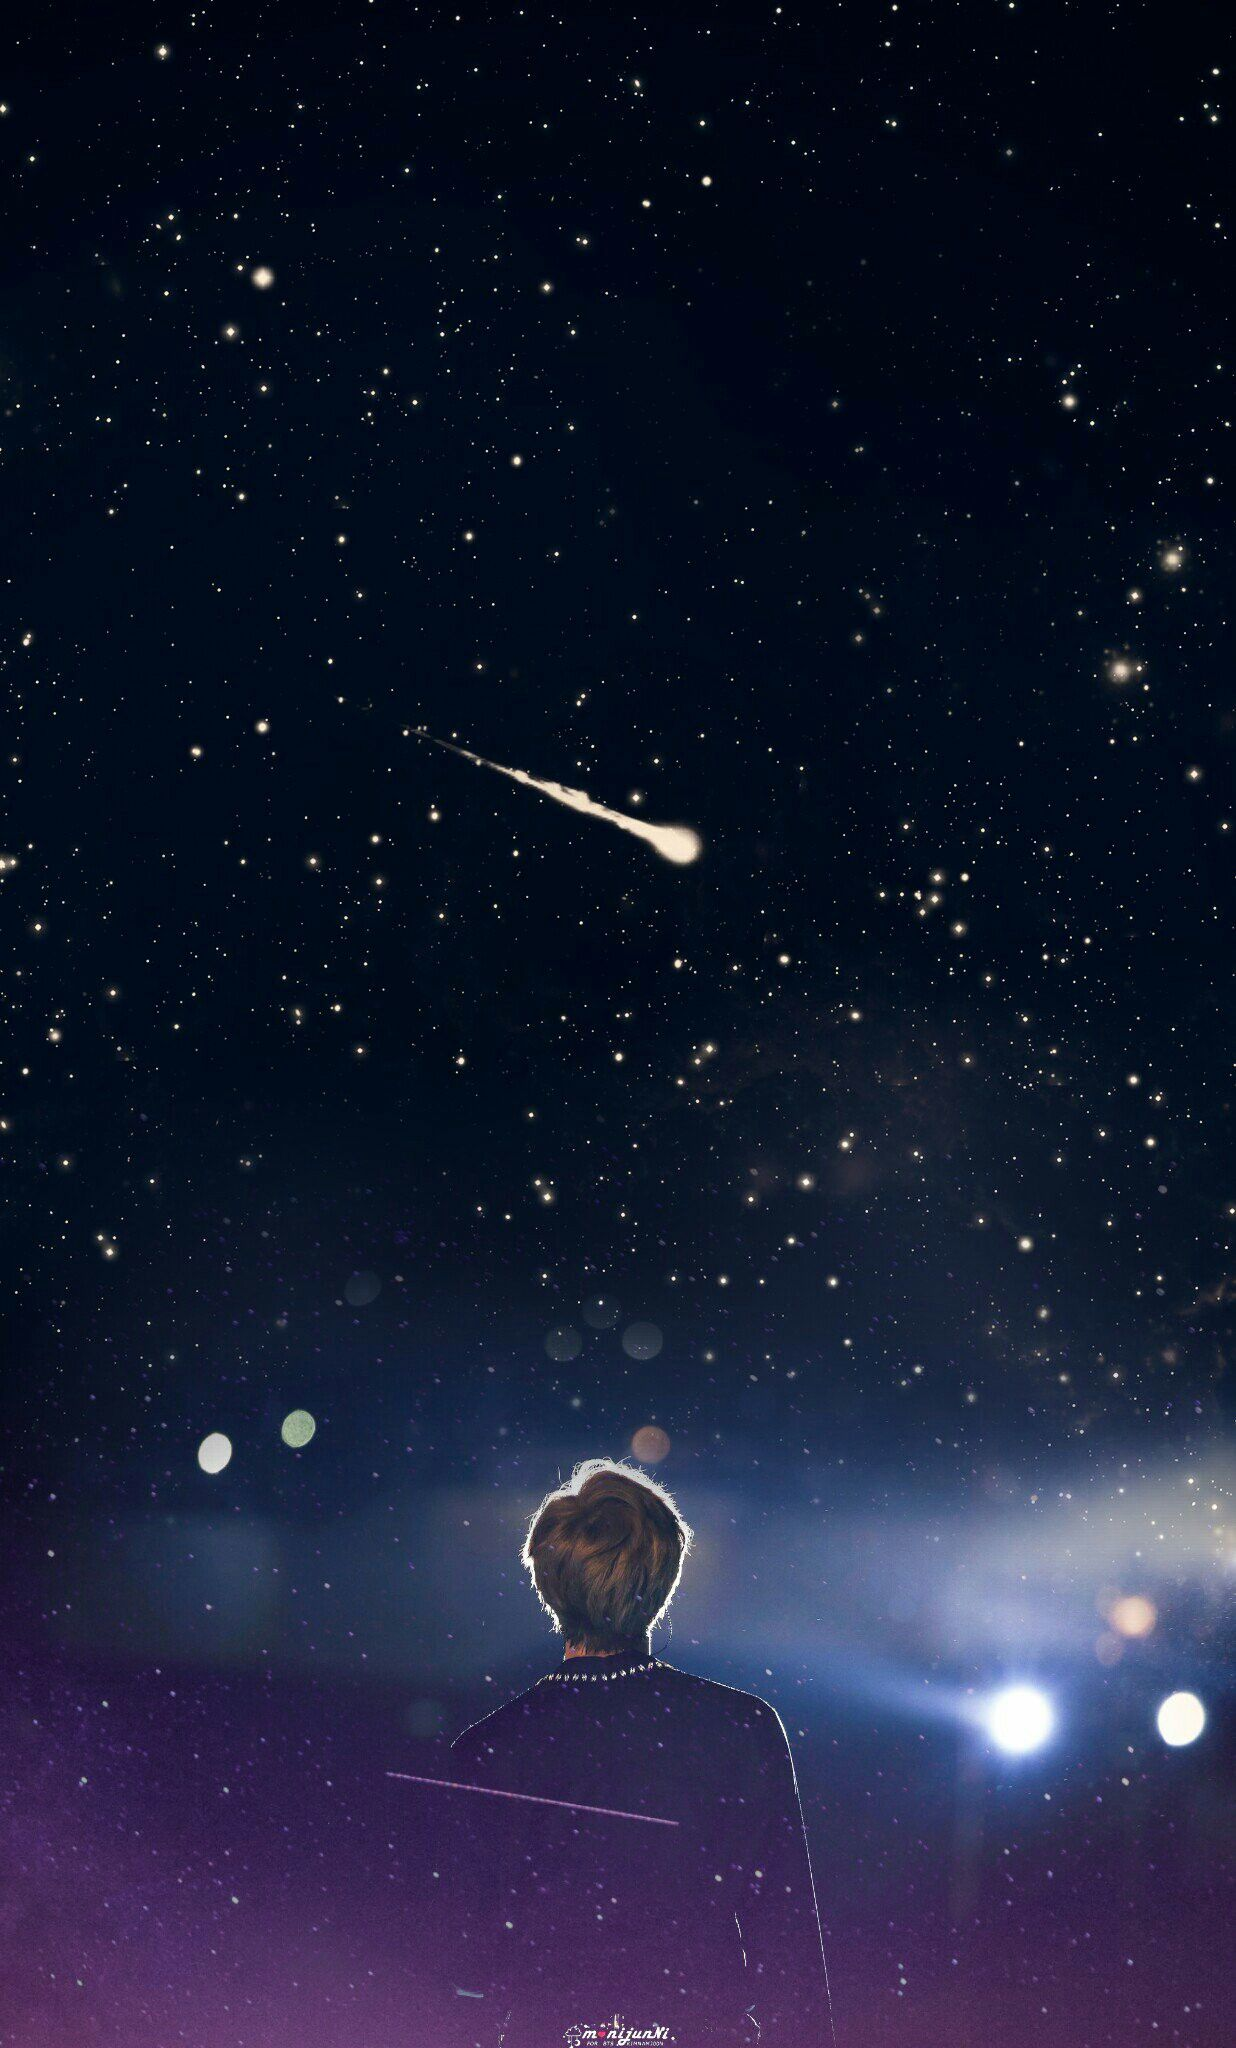 I believe in your galaxy | Bts wallpaper, Kpop wallpaper, Bts fanart